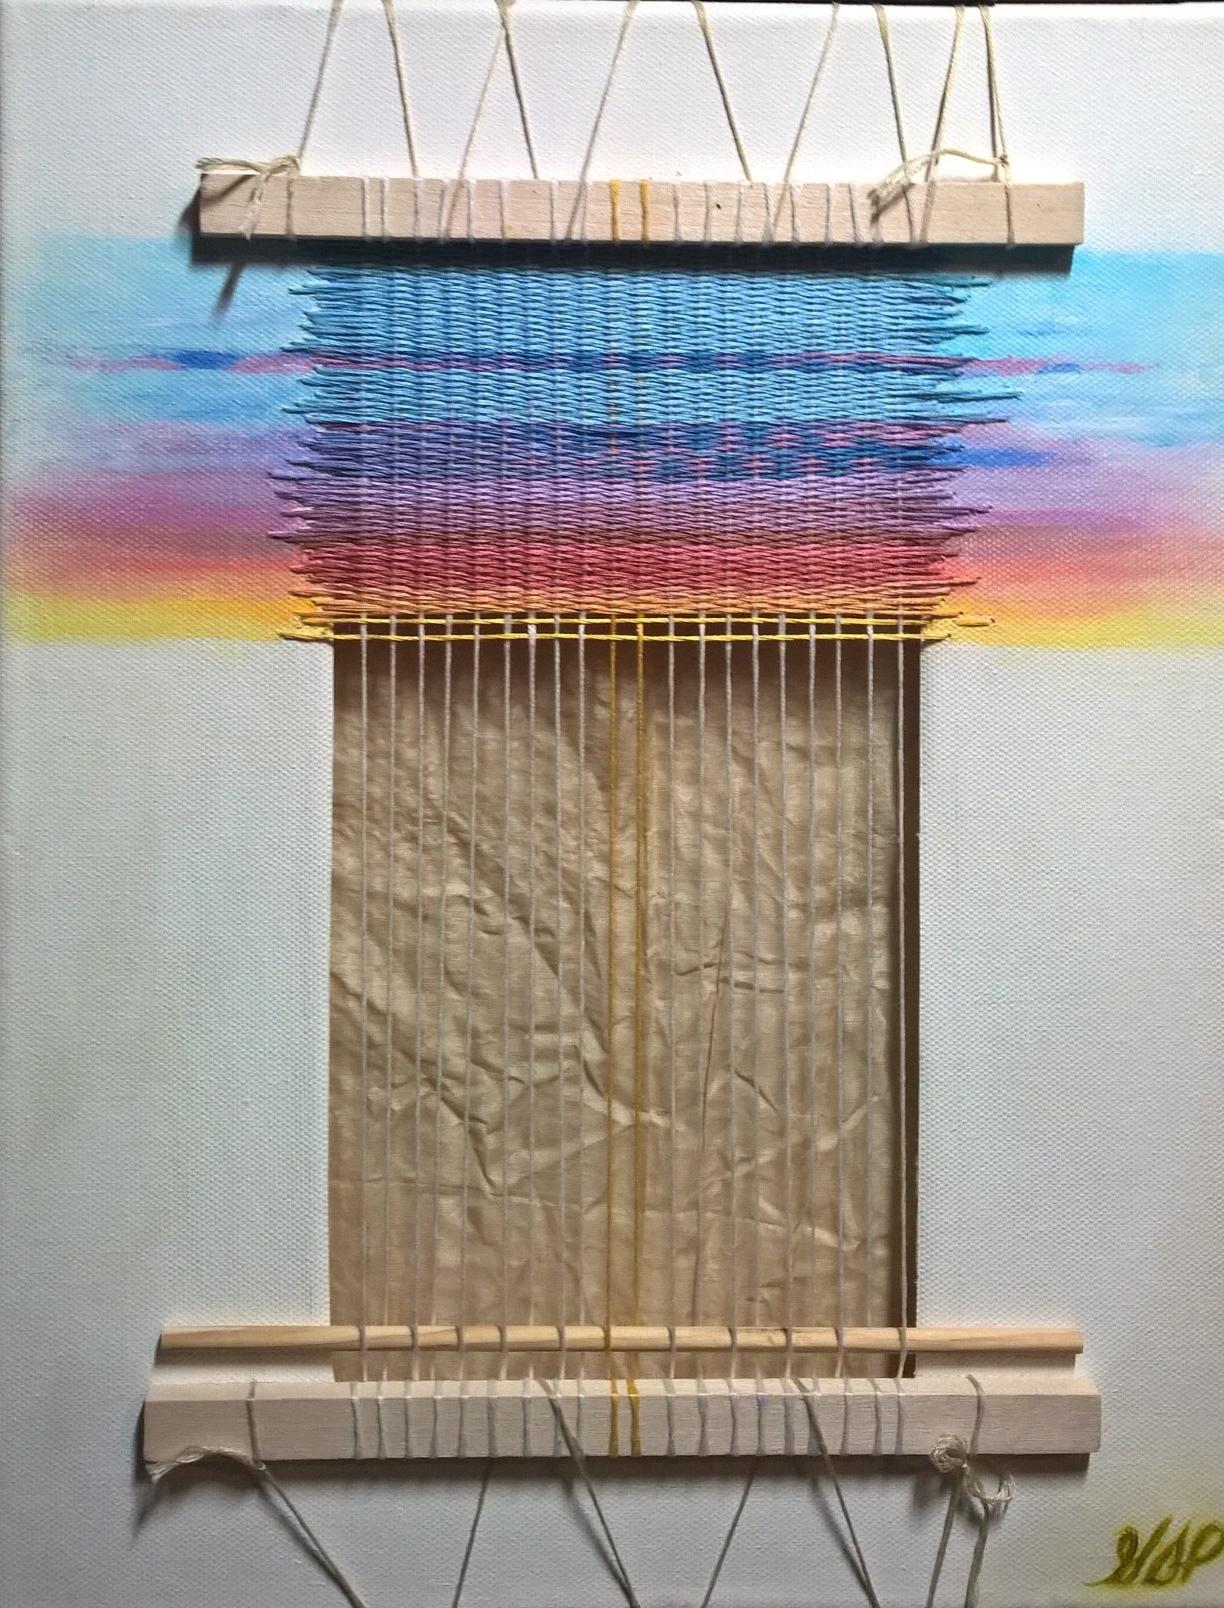 Weaving the Sunrise